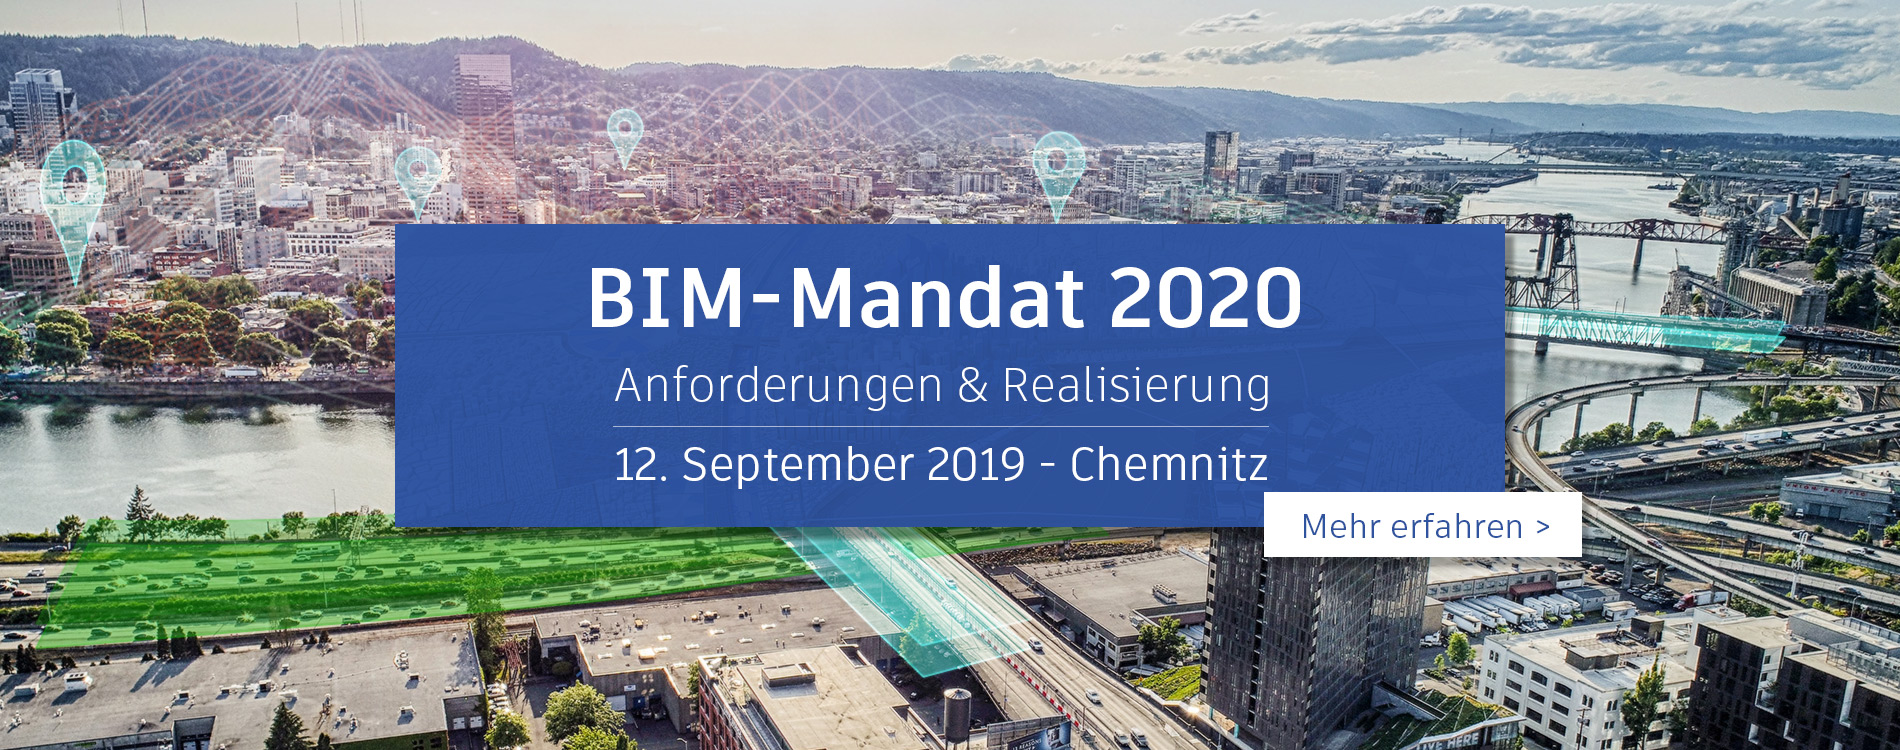 BIM-Mandat 2020